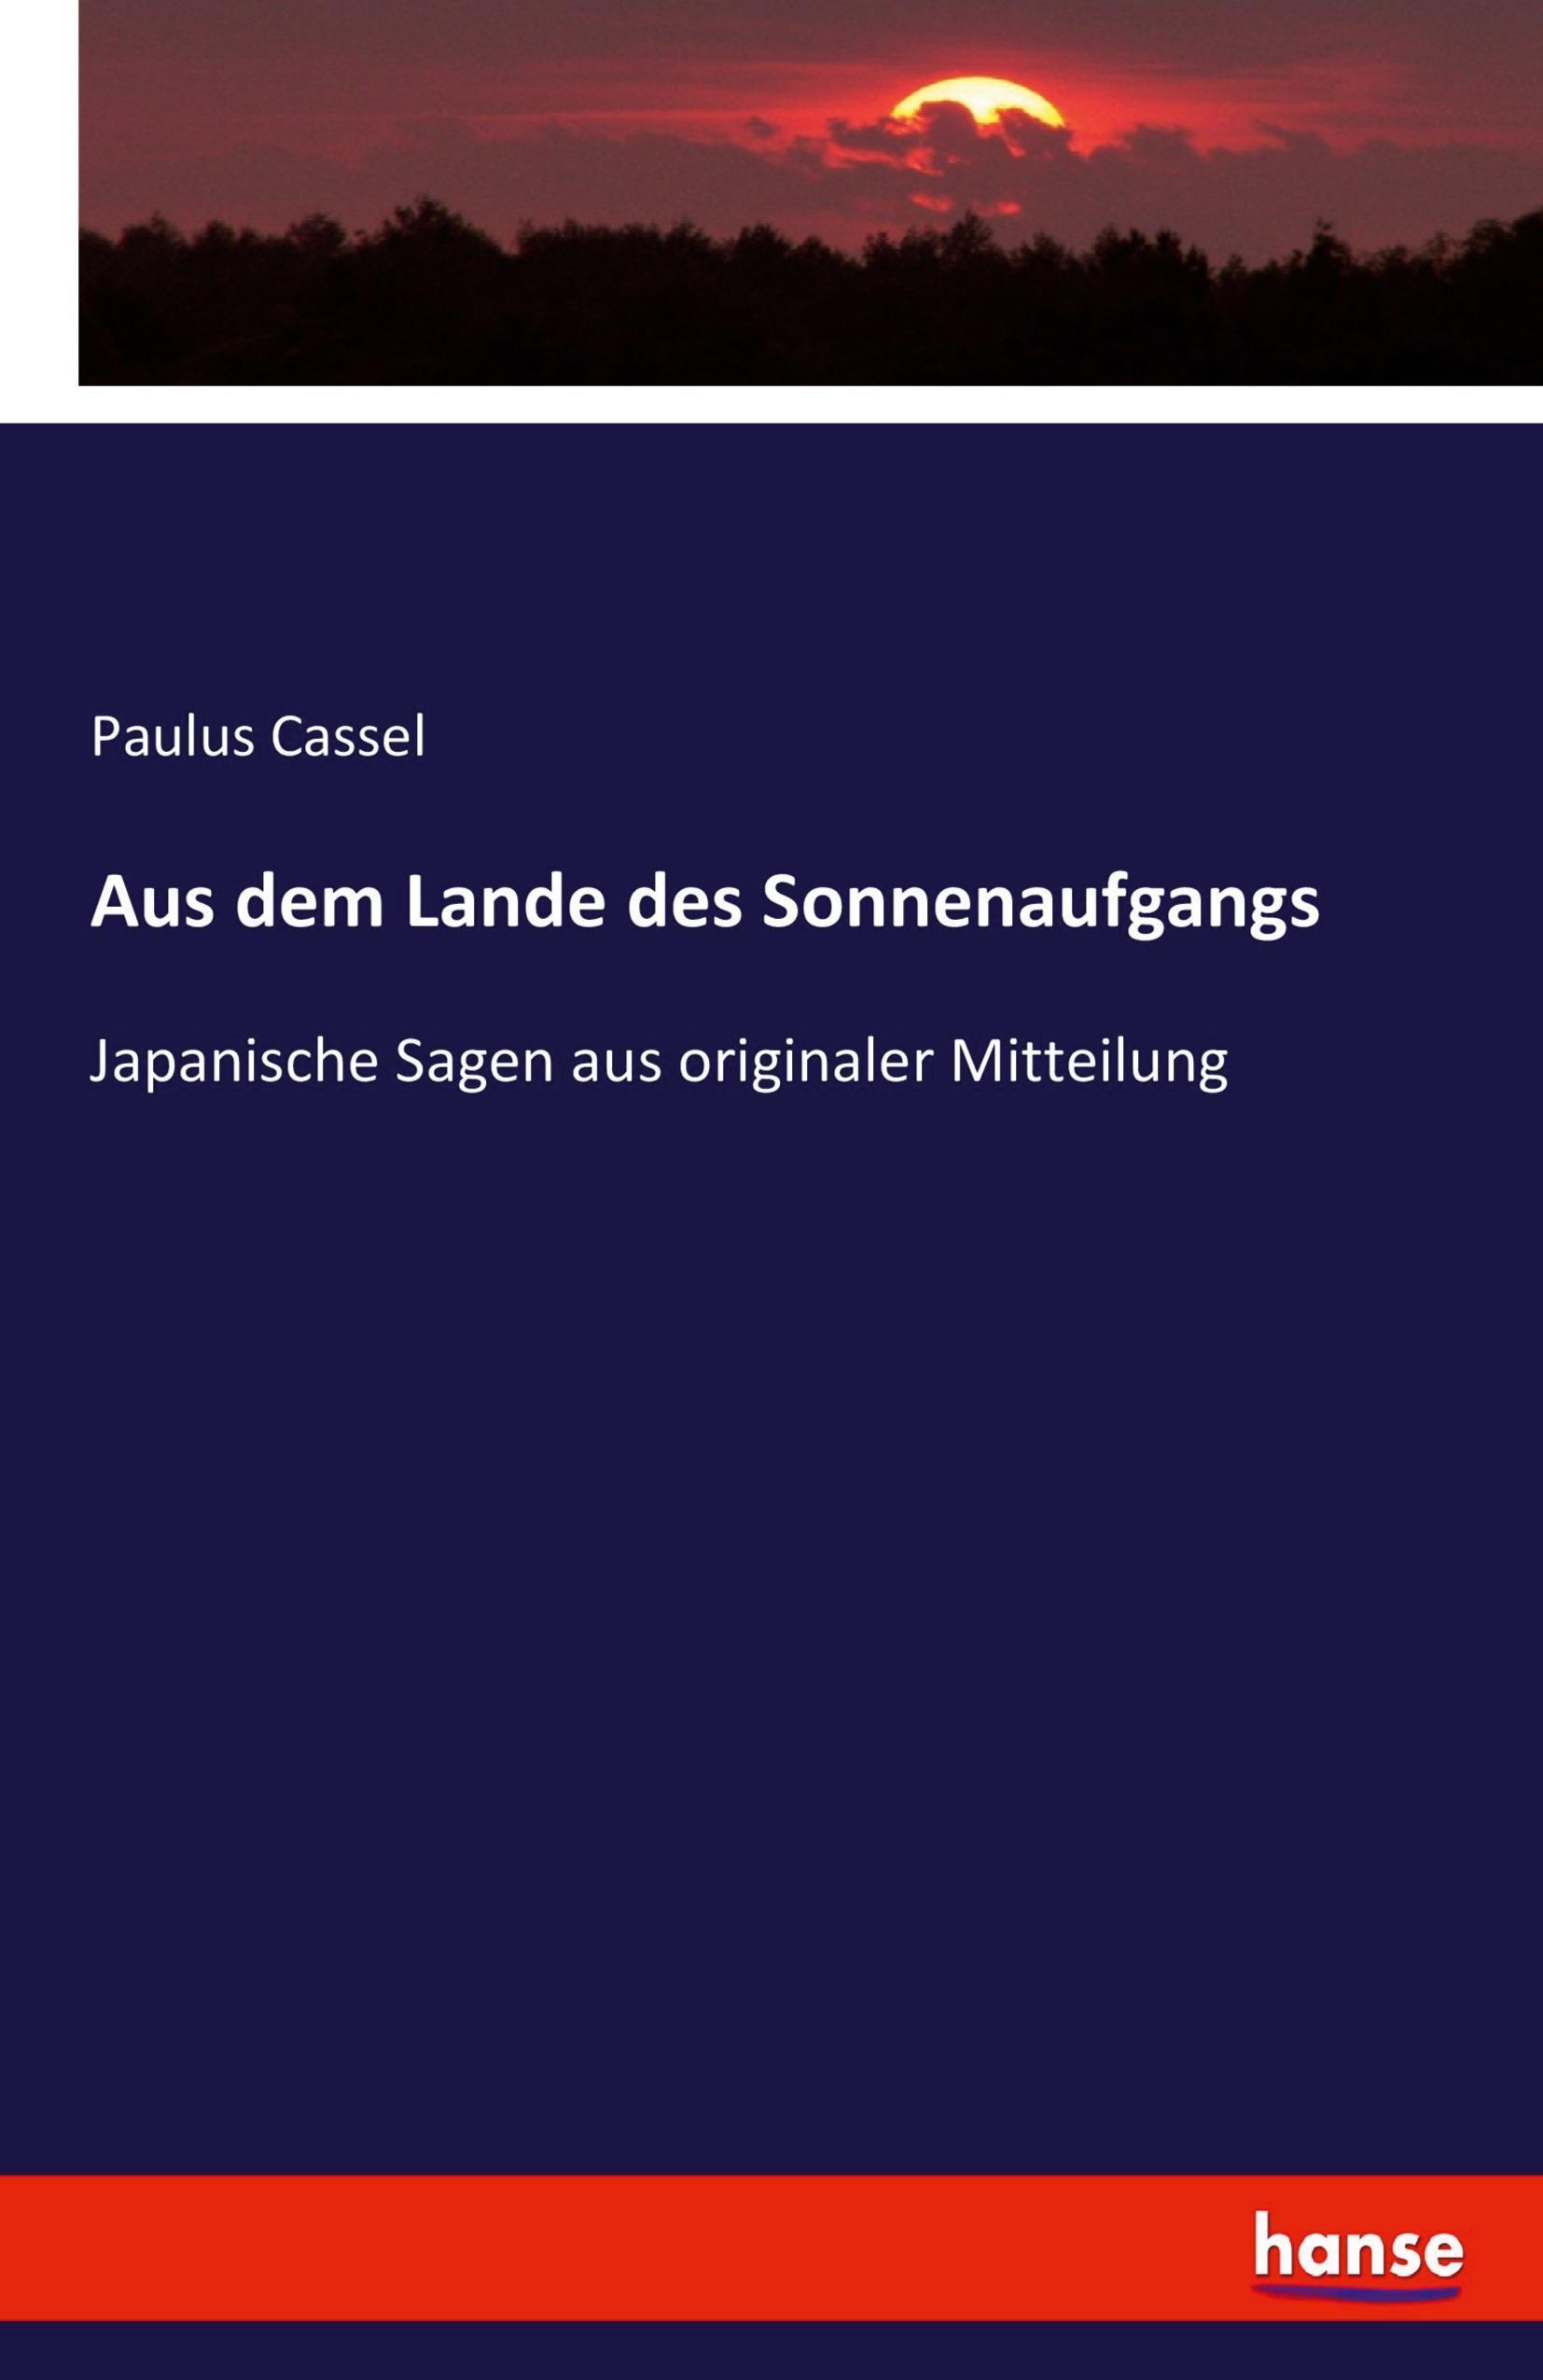 Paulus Cassel / Aus dem Lande des Sonnenaufgangs 9783741141362